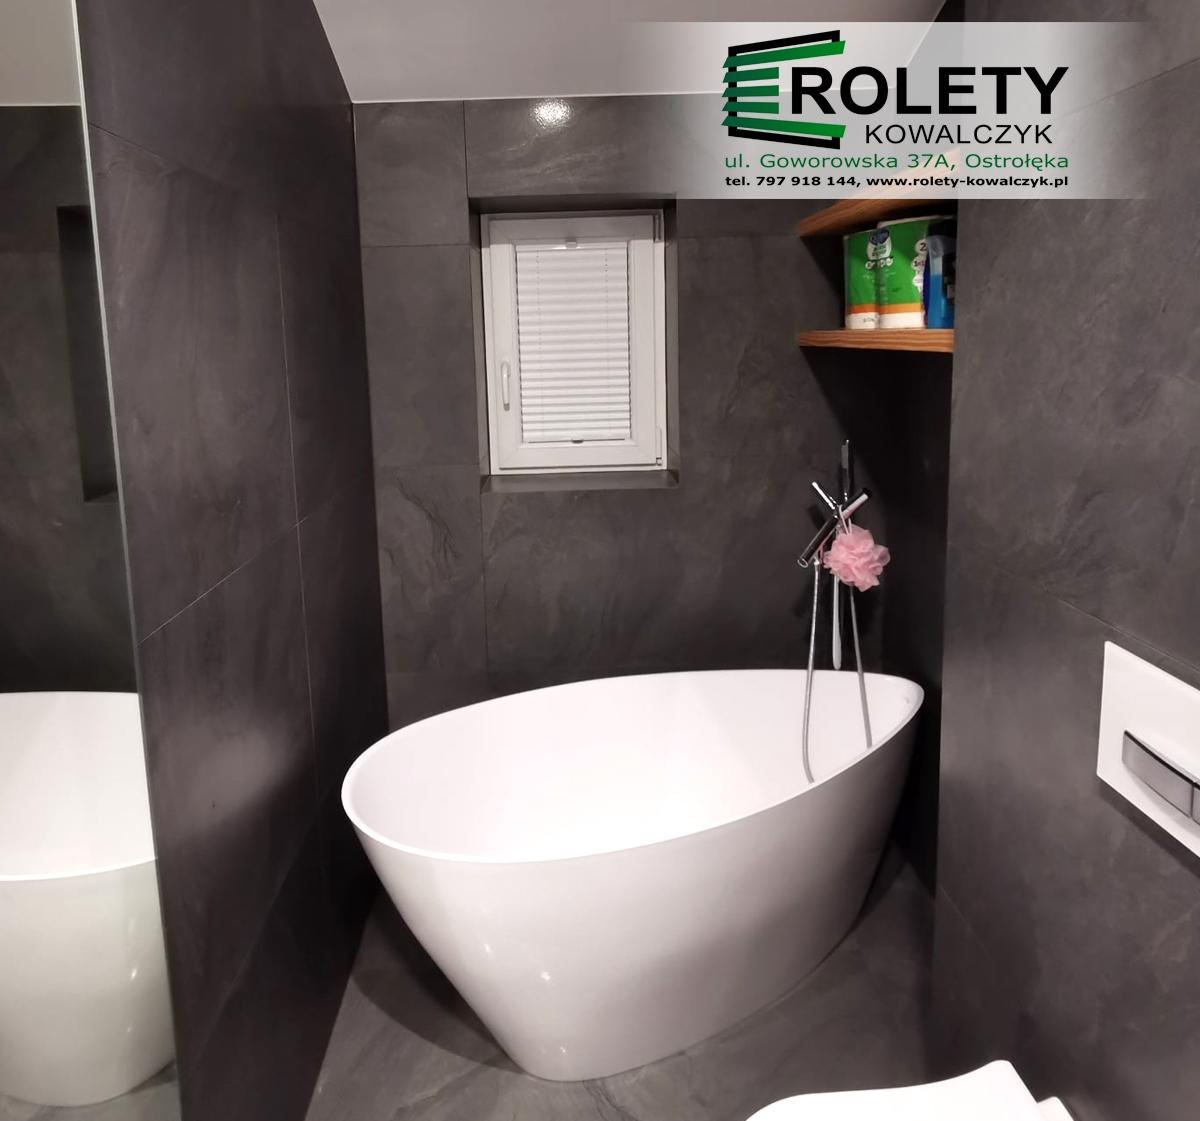 rolety-kowalczyk_ostroleka_goworowska37A_063